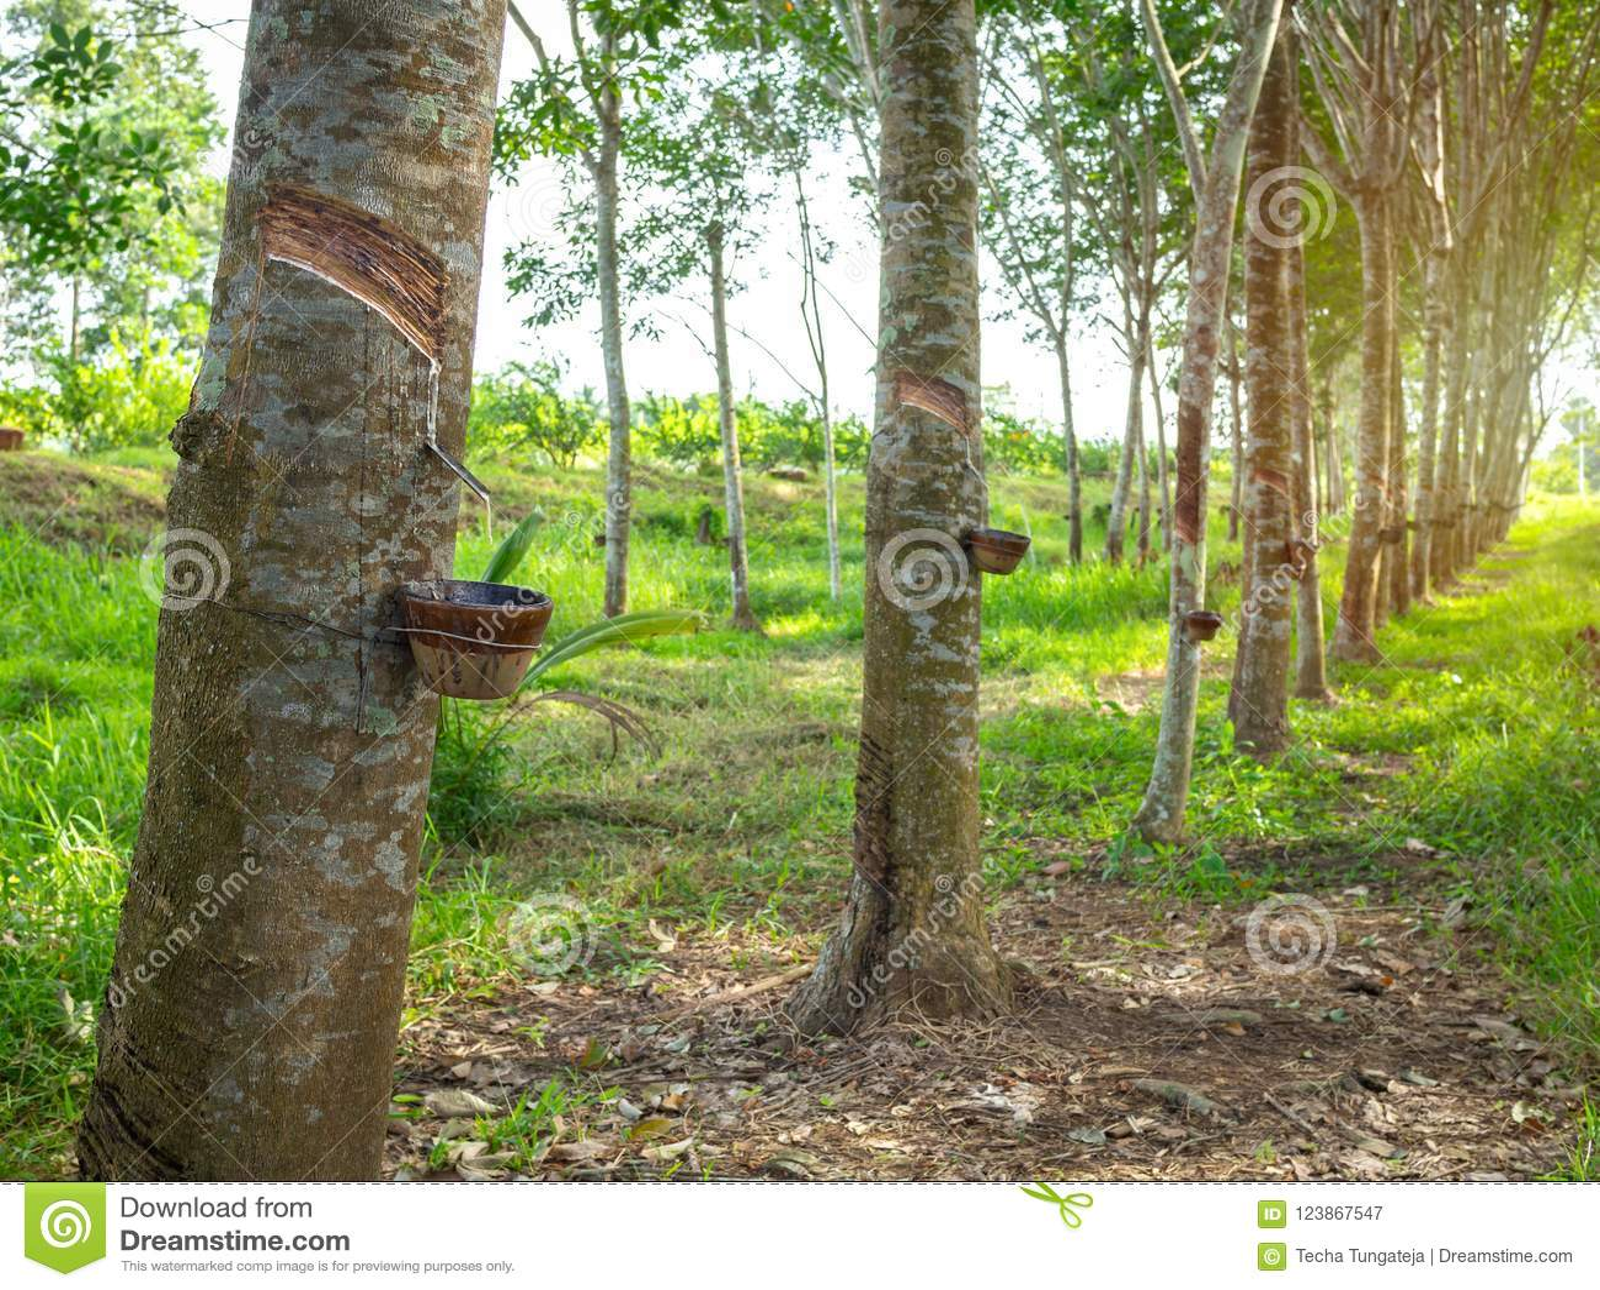 Rubber tree stock image  Image of green, farm, landscape